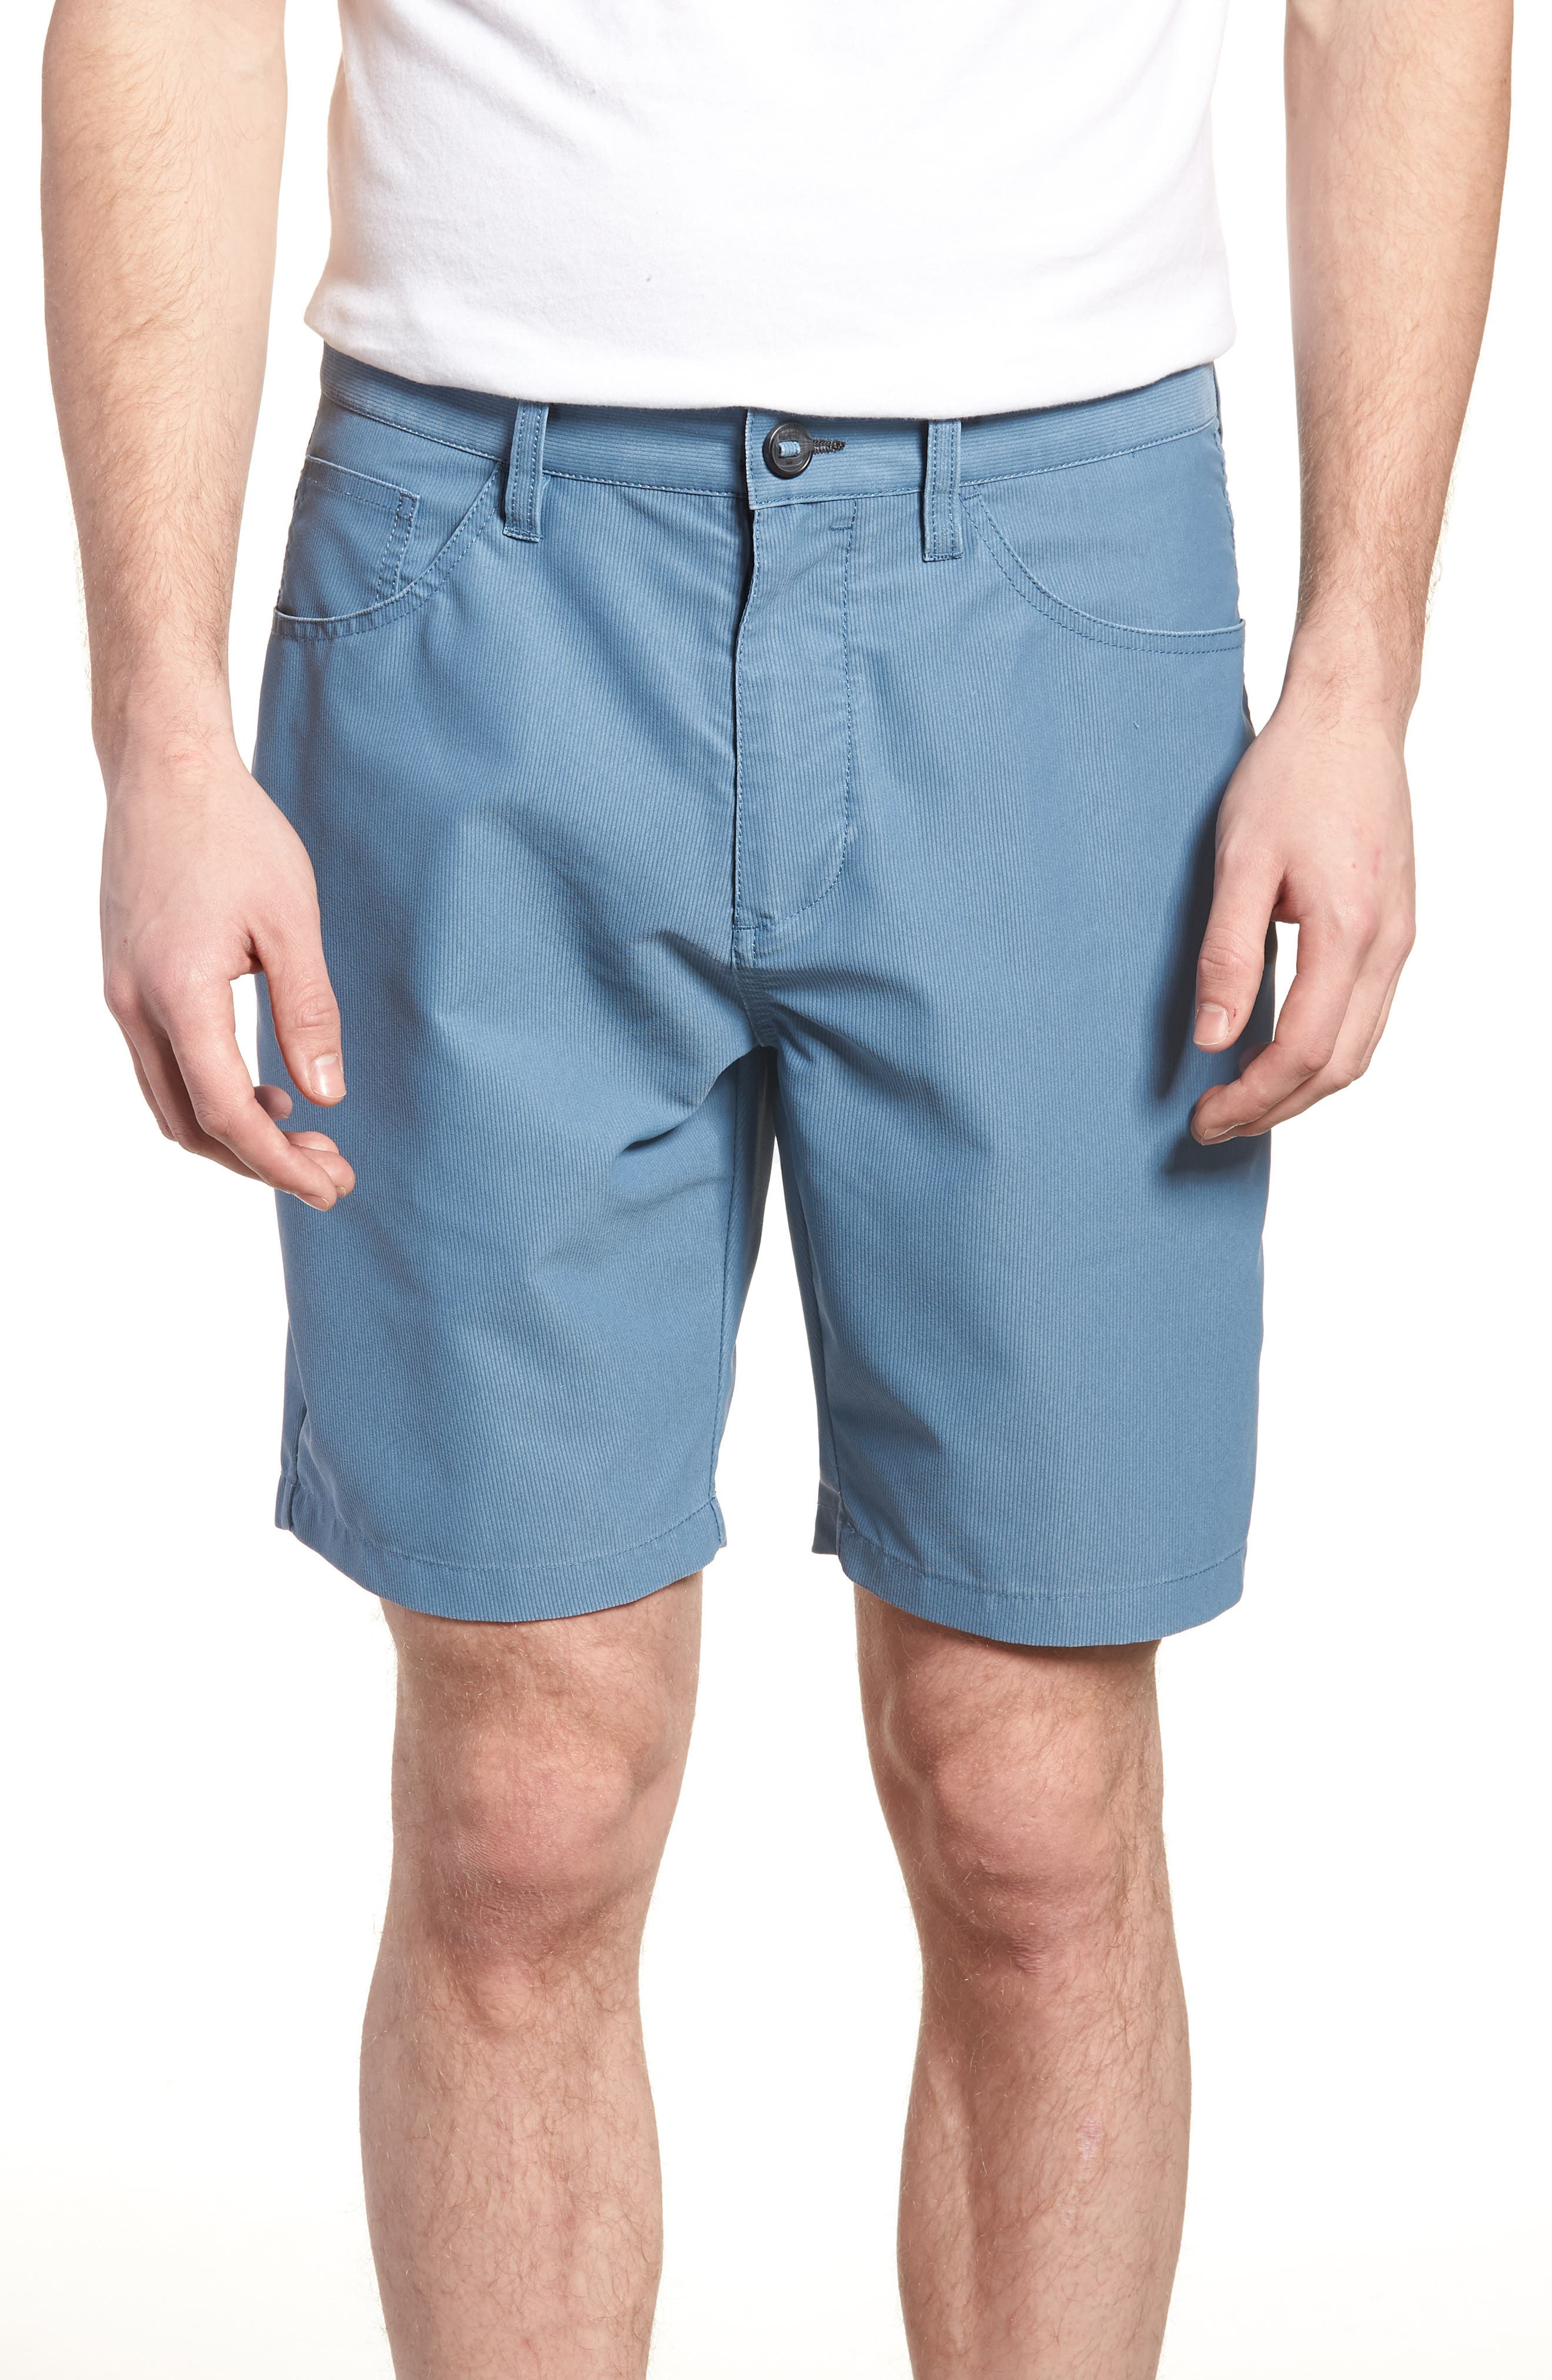 Outsider X Surf Corduroy Shorts,                             Main thumbnail 1, color,                             Powder Blue